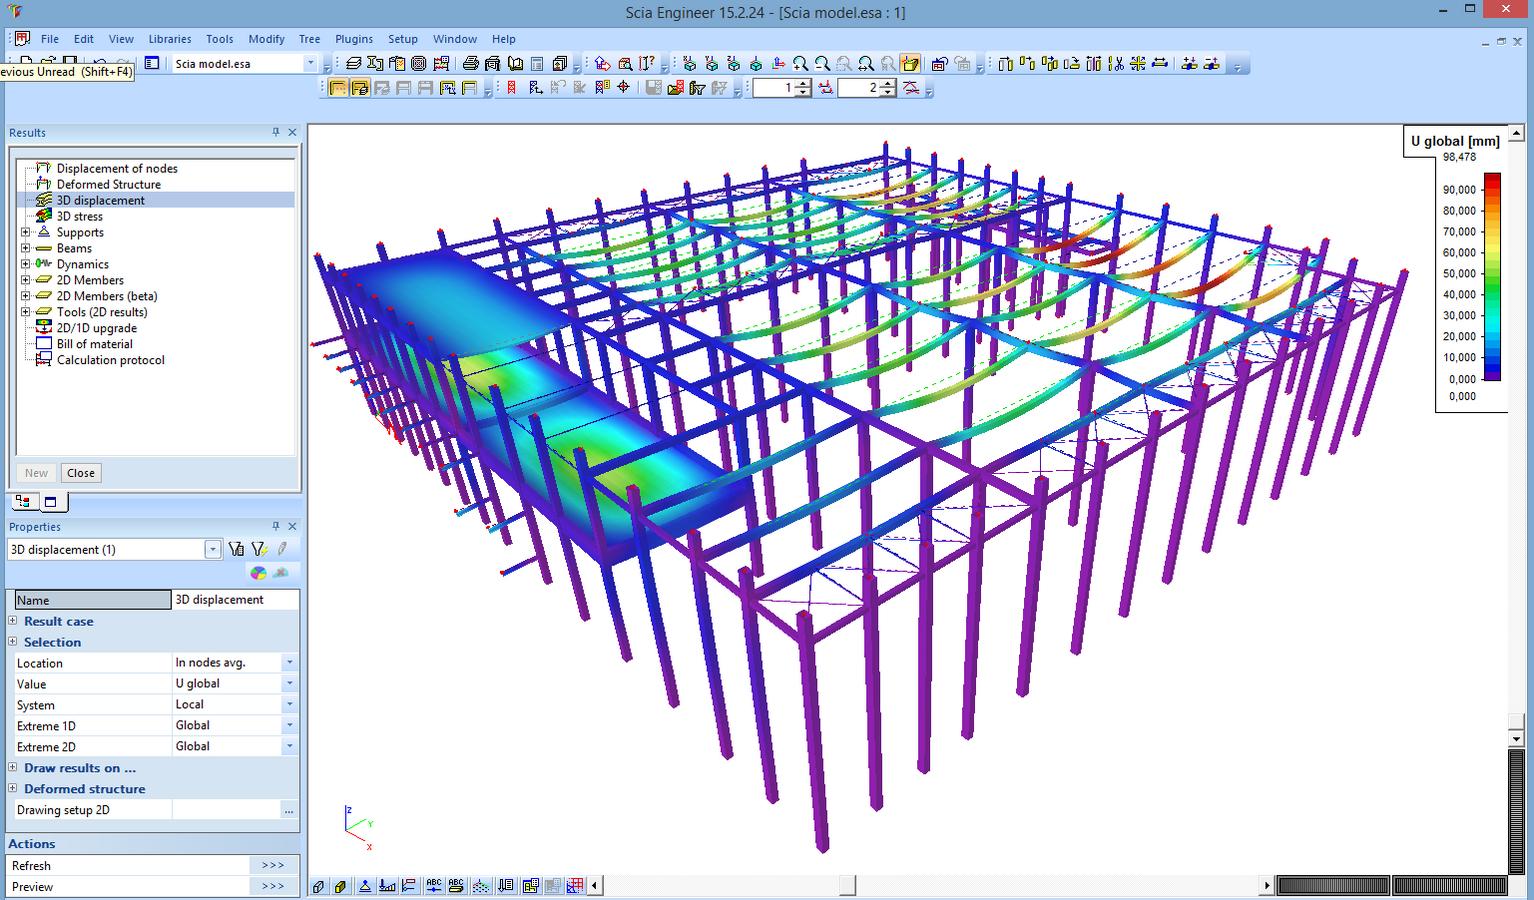 3D Displacements & Stresses